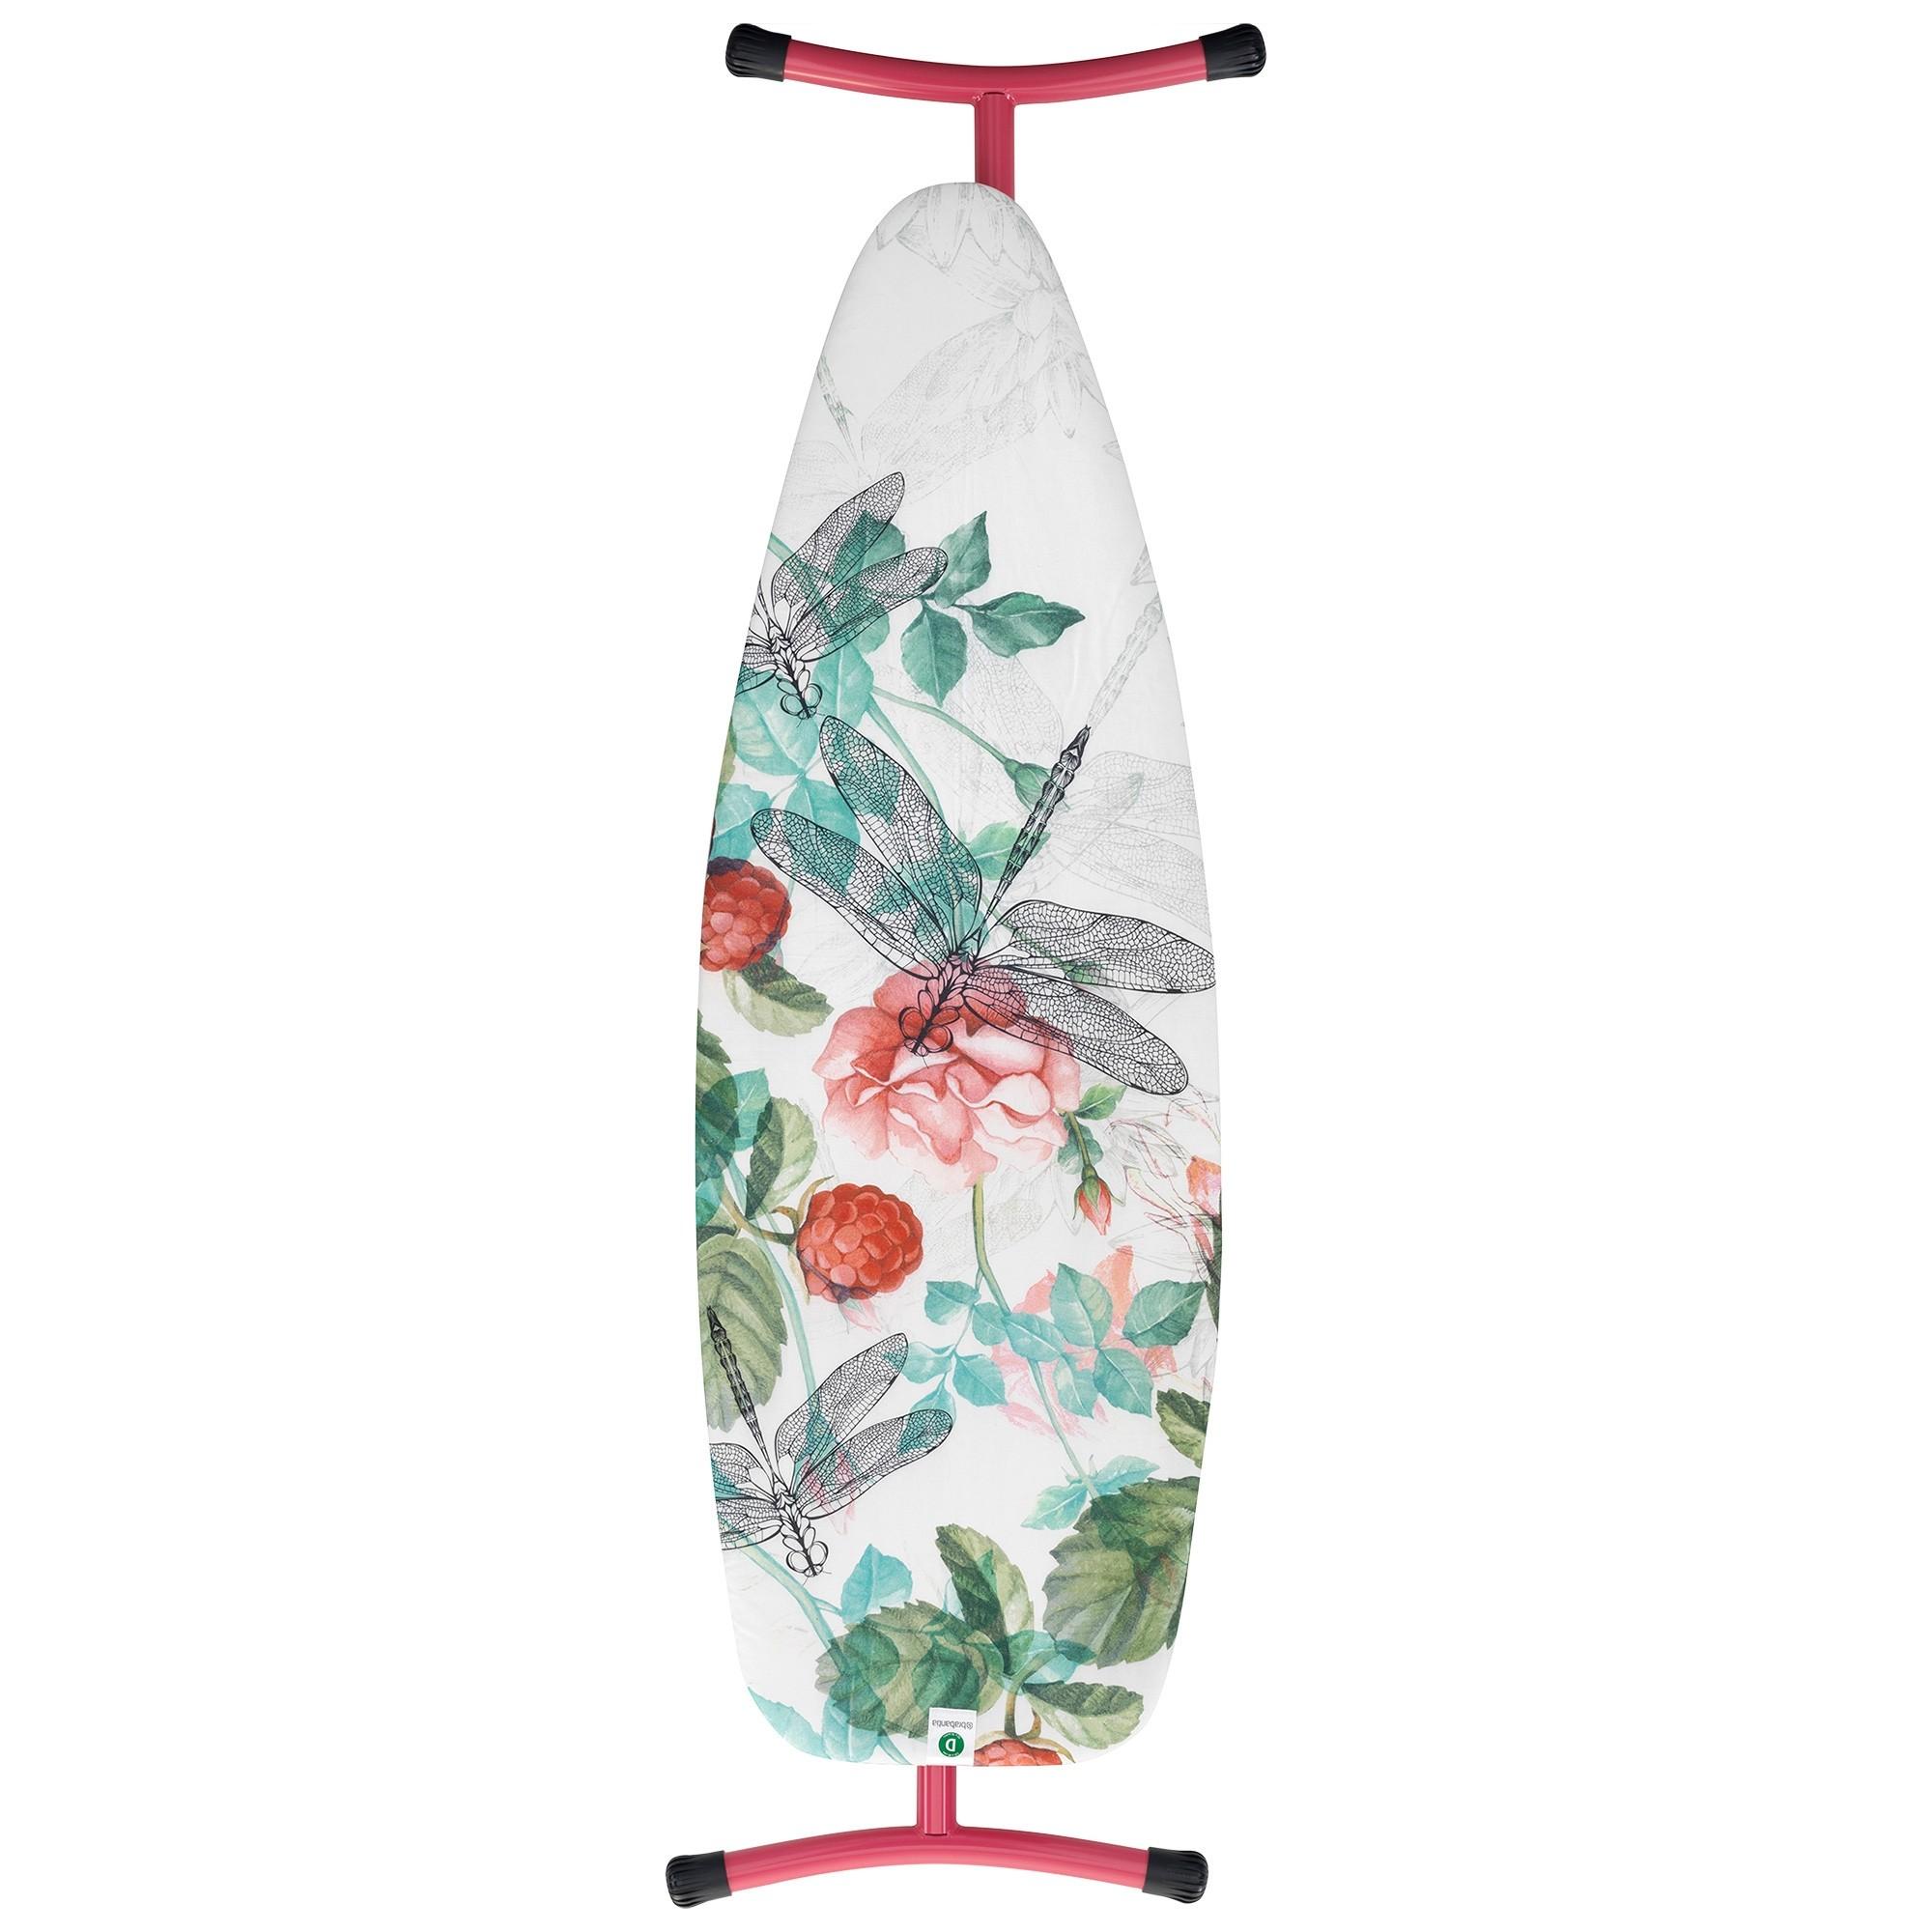 Brabantia Raspberry Ironing Board, 135x45cm